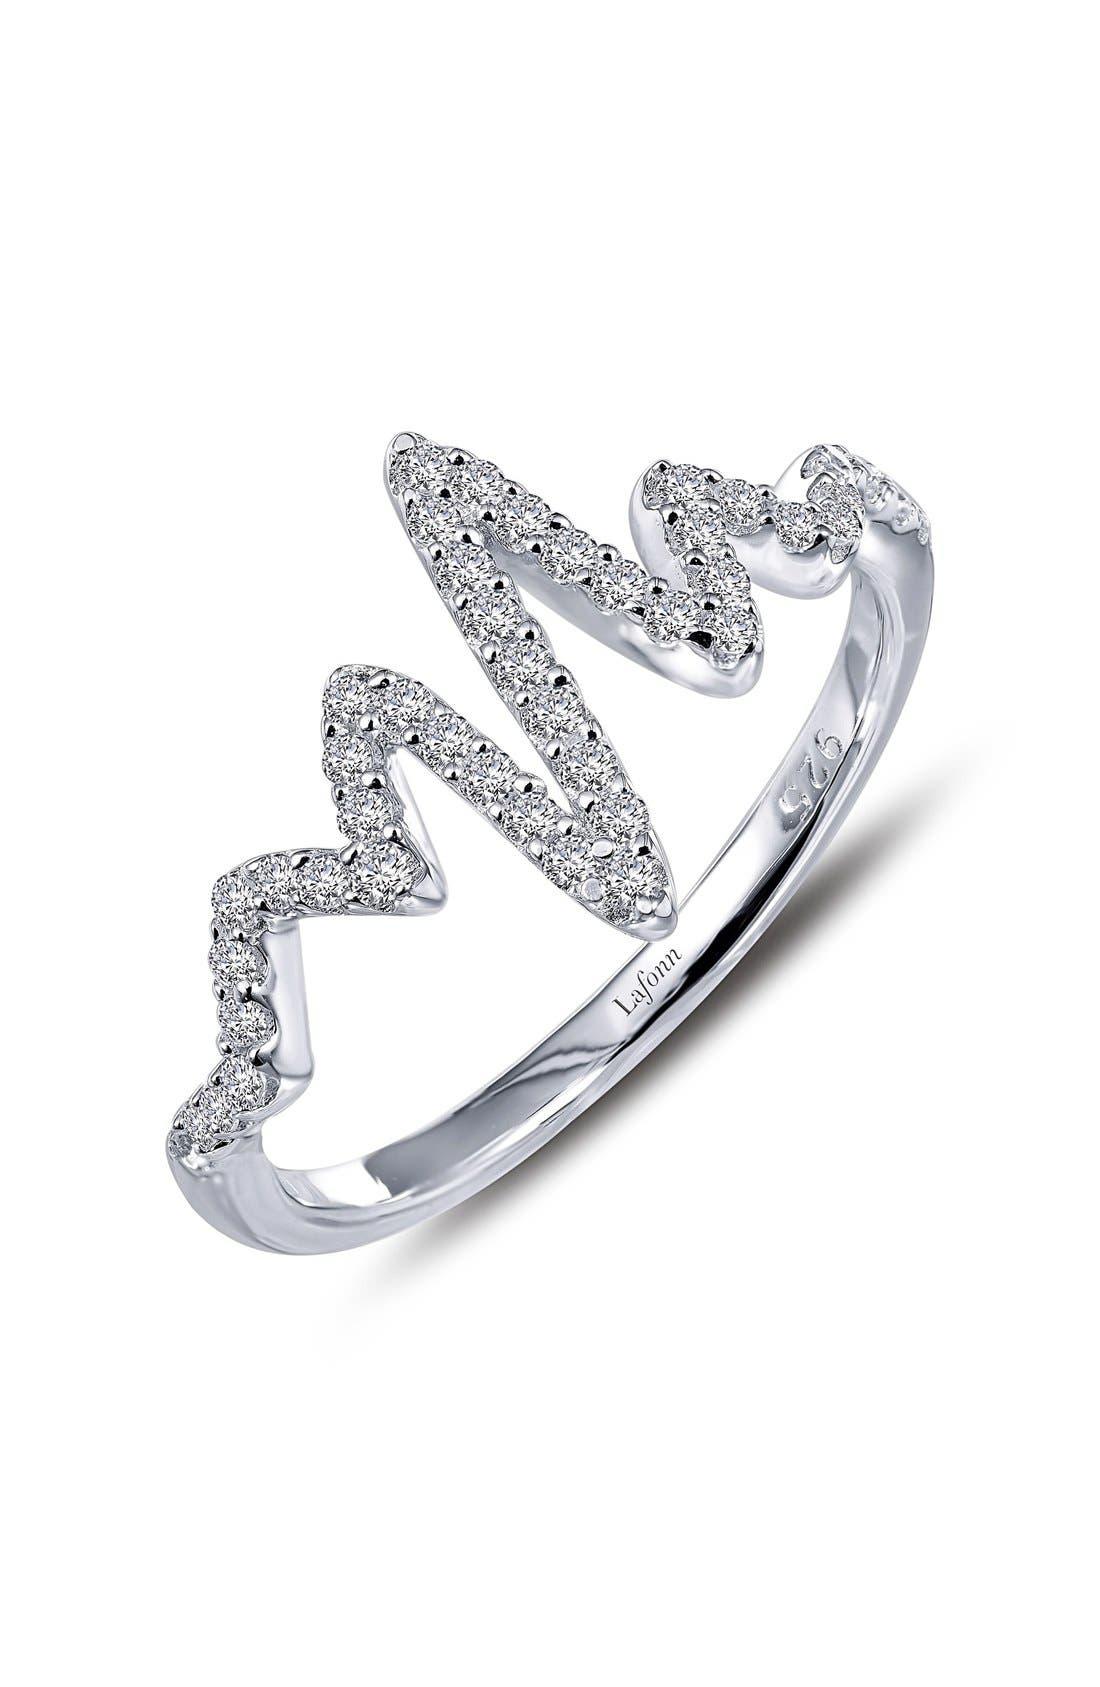 Alternate Image 1 Selected - Lafonn 'Lassaire' Pulse Ring